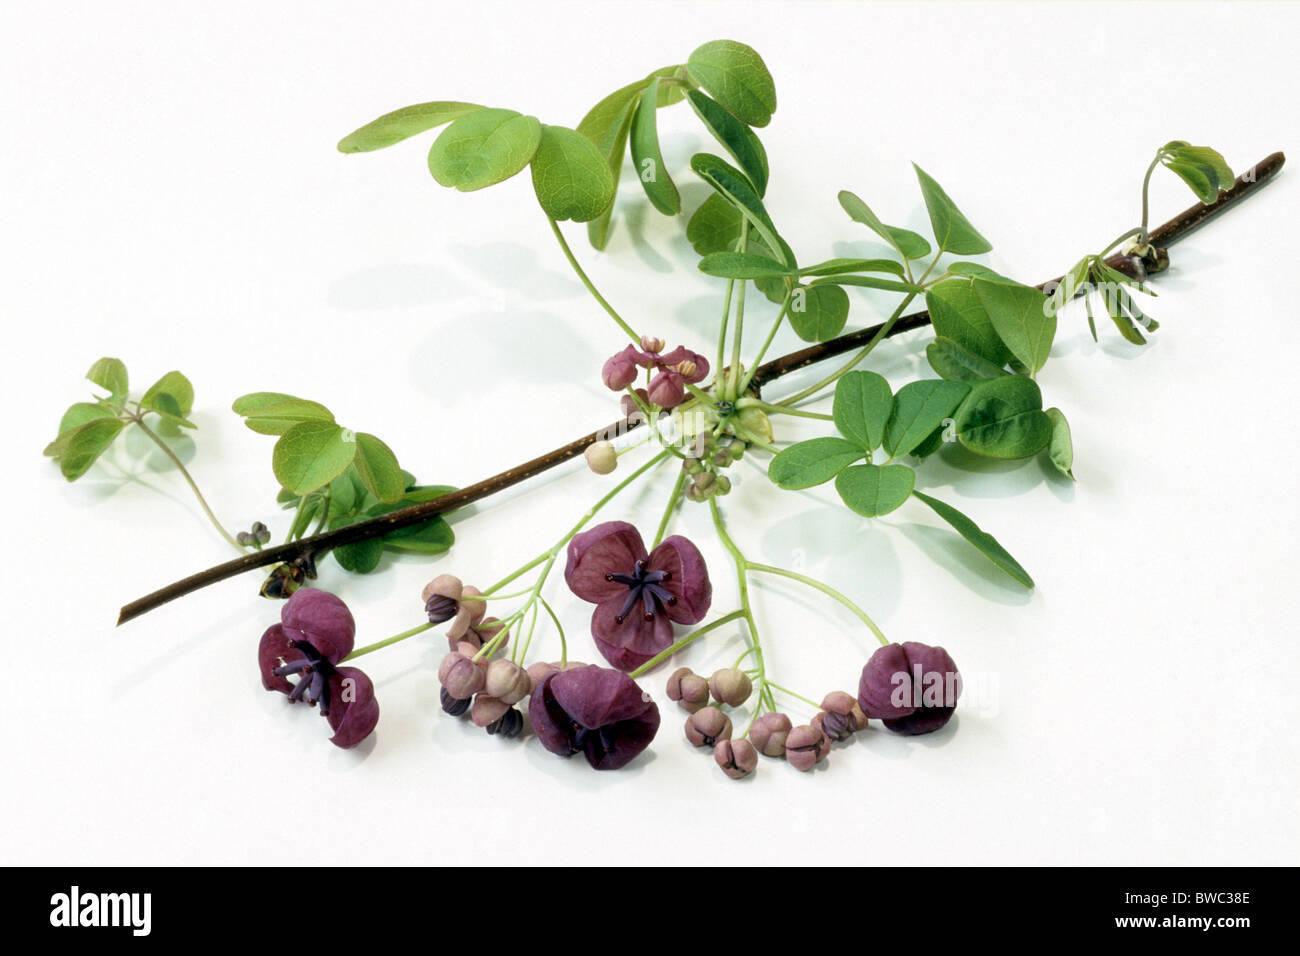 Chocolate Vine, Five Leaf Akebia (Akebia quinata), twig with ...